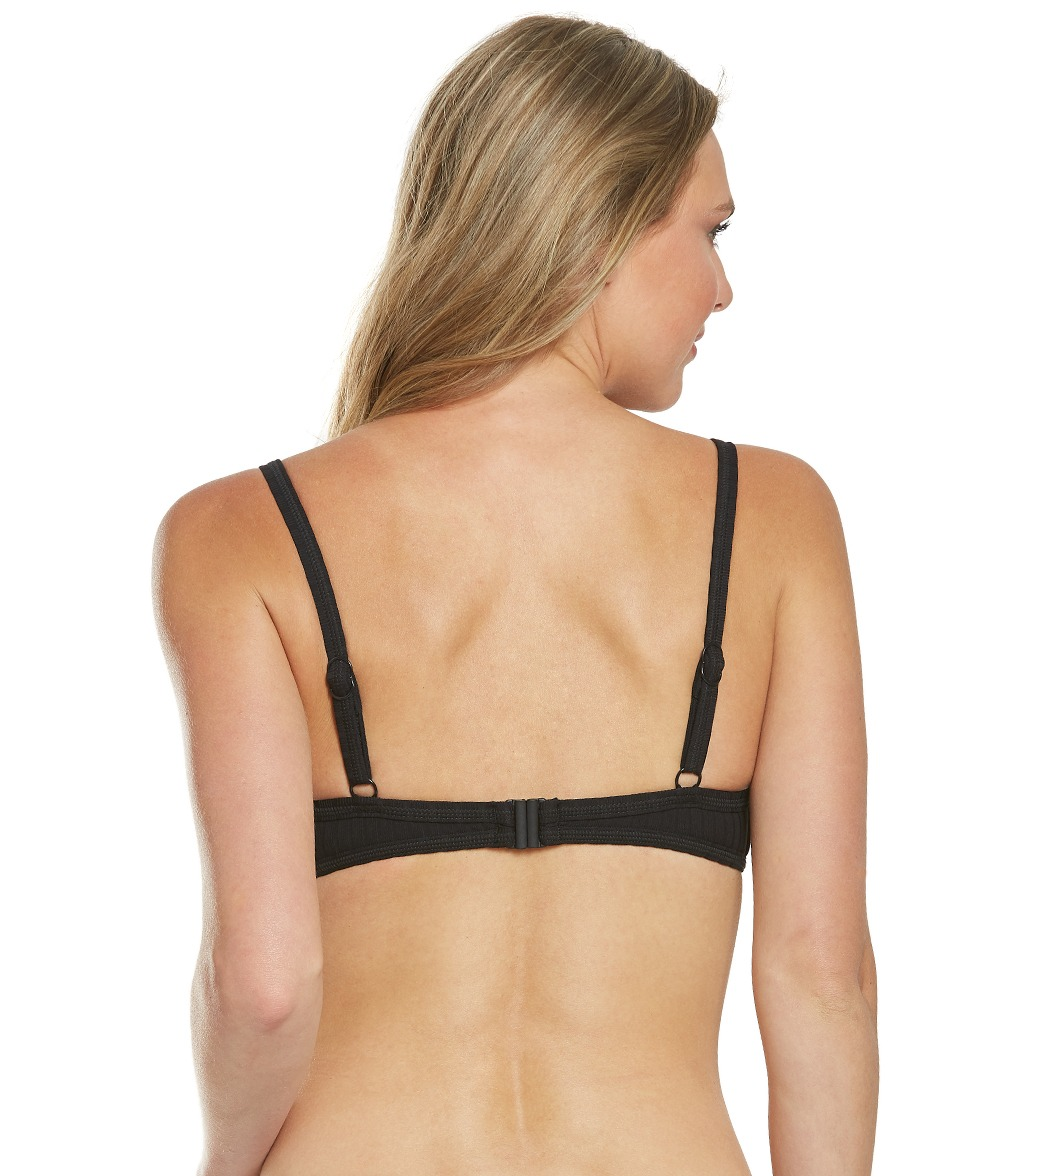 807315cb69 Seafolly Inka Rib Lace Up Bralette Bikini Top at SwimOutlet.com ...